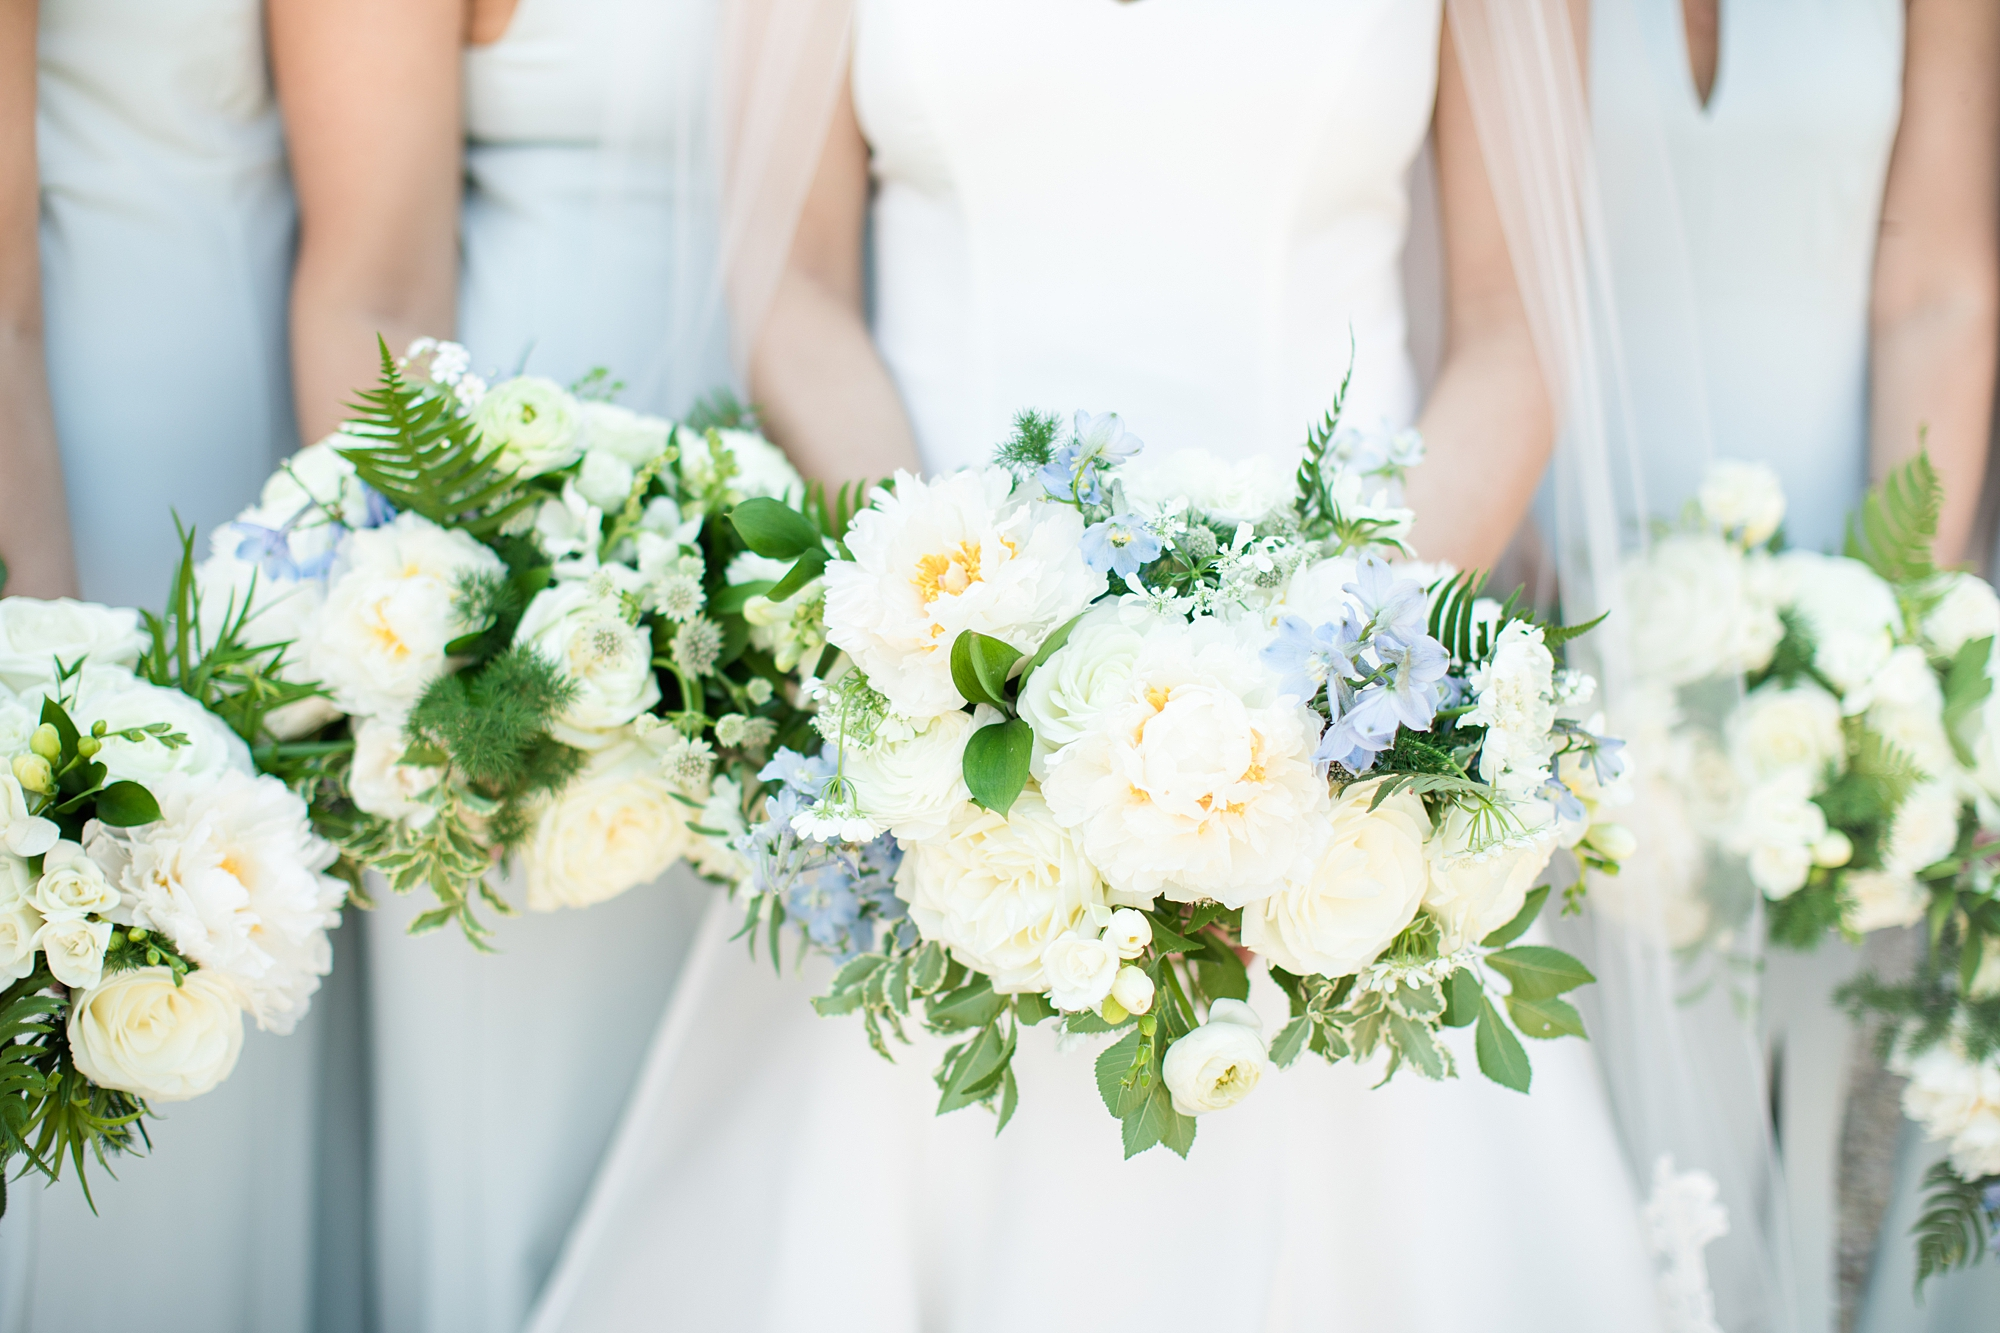 dover-hall-estate-richmond-wedding-goochland-virginiadover-hall-estate-richmond-wedding-goochland-virginia_5302